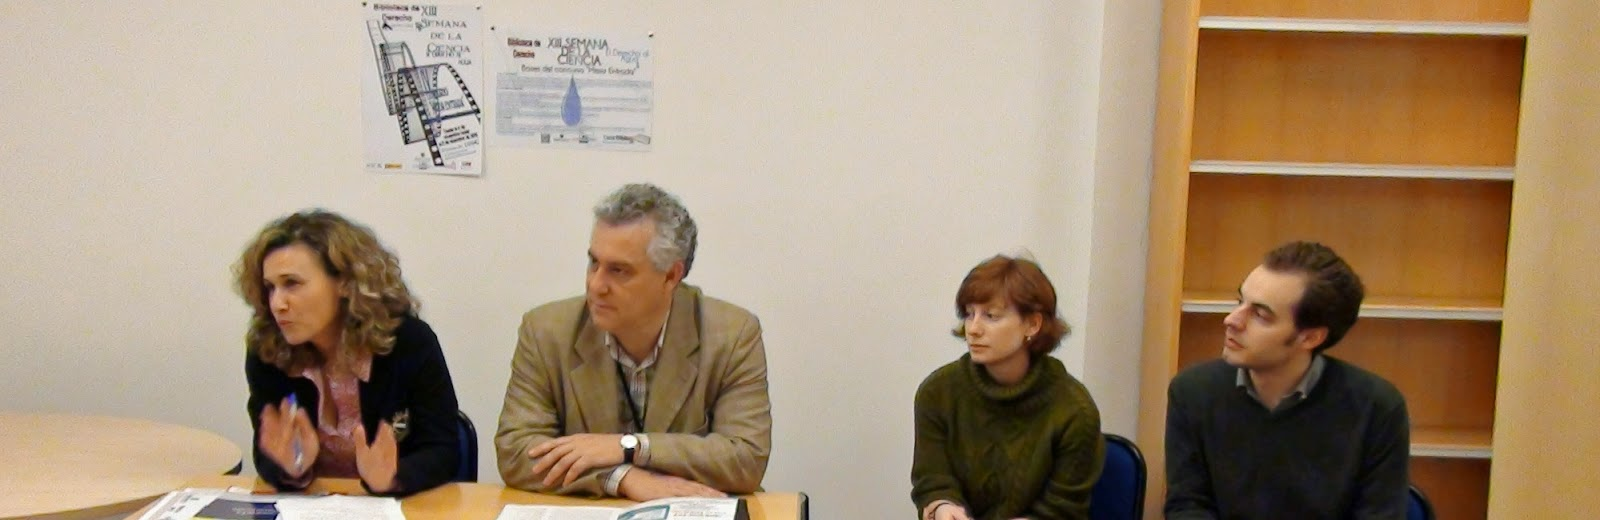 Nieves Martínez, Santiago Fernández, Mariana López y F. J. Valentín